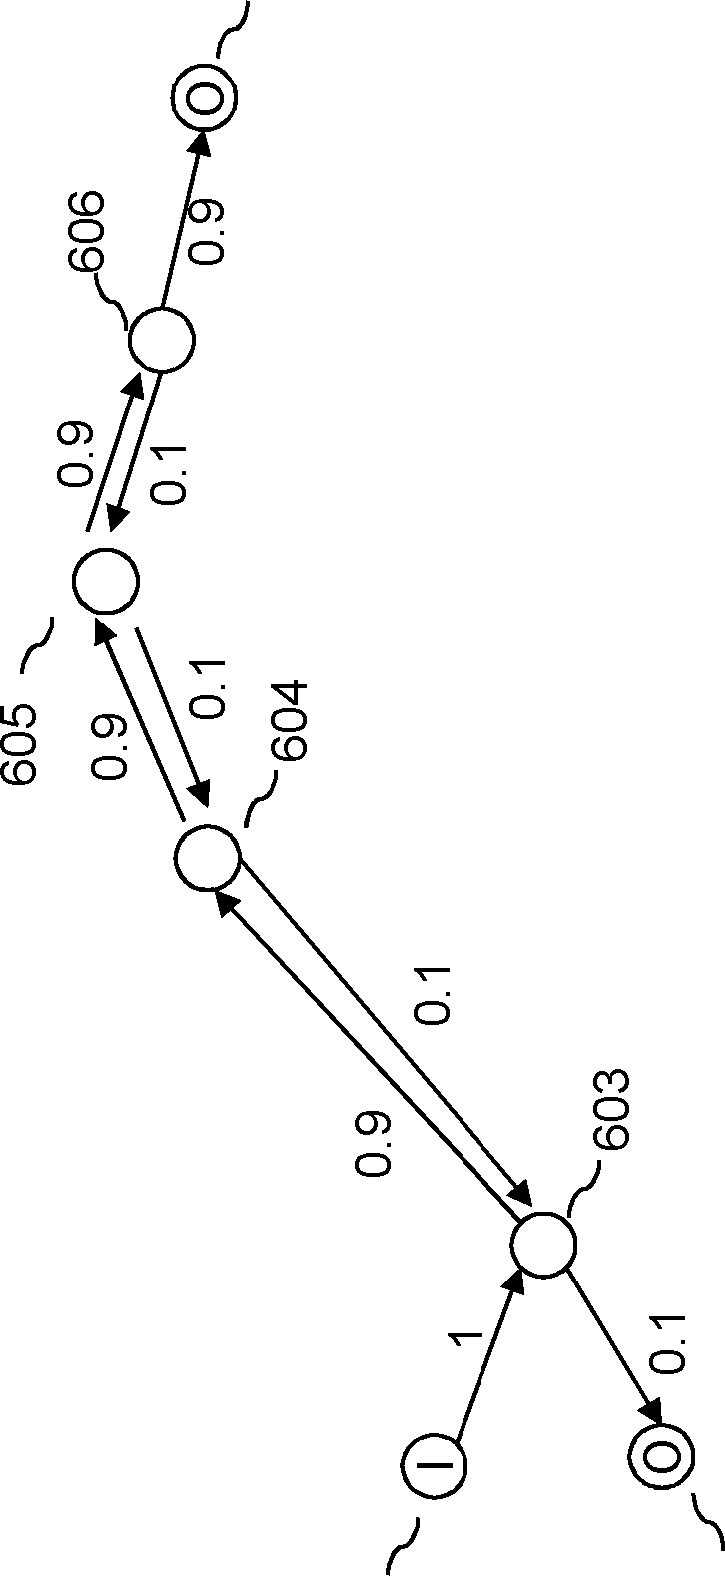 Figure GB2553108A_D0007